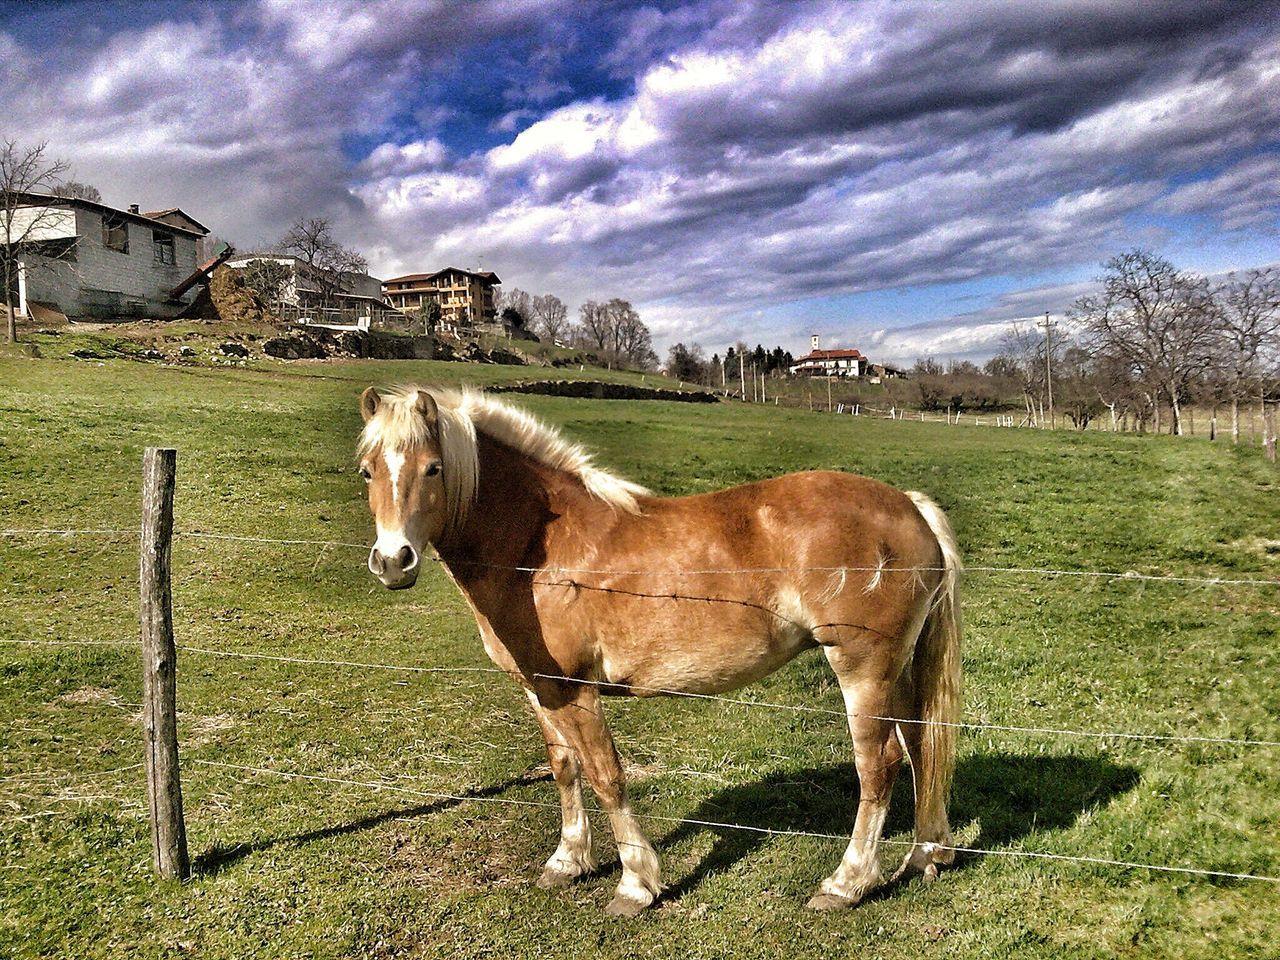 Horse Animal Themes